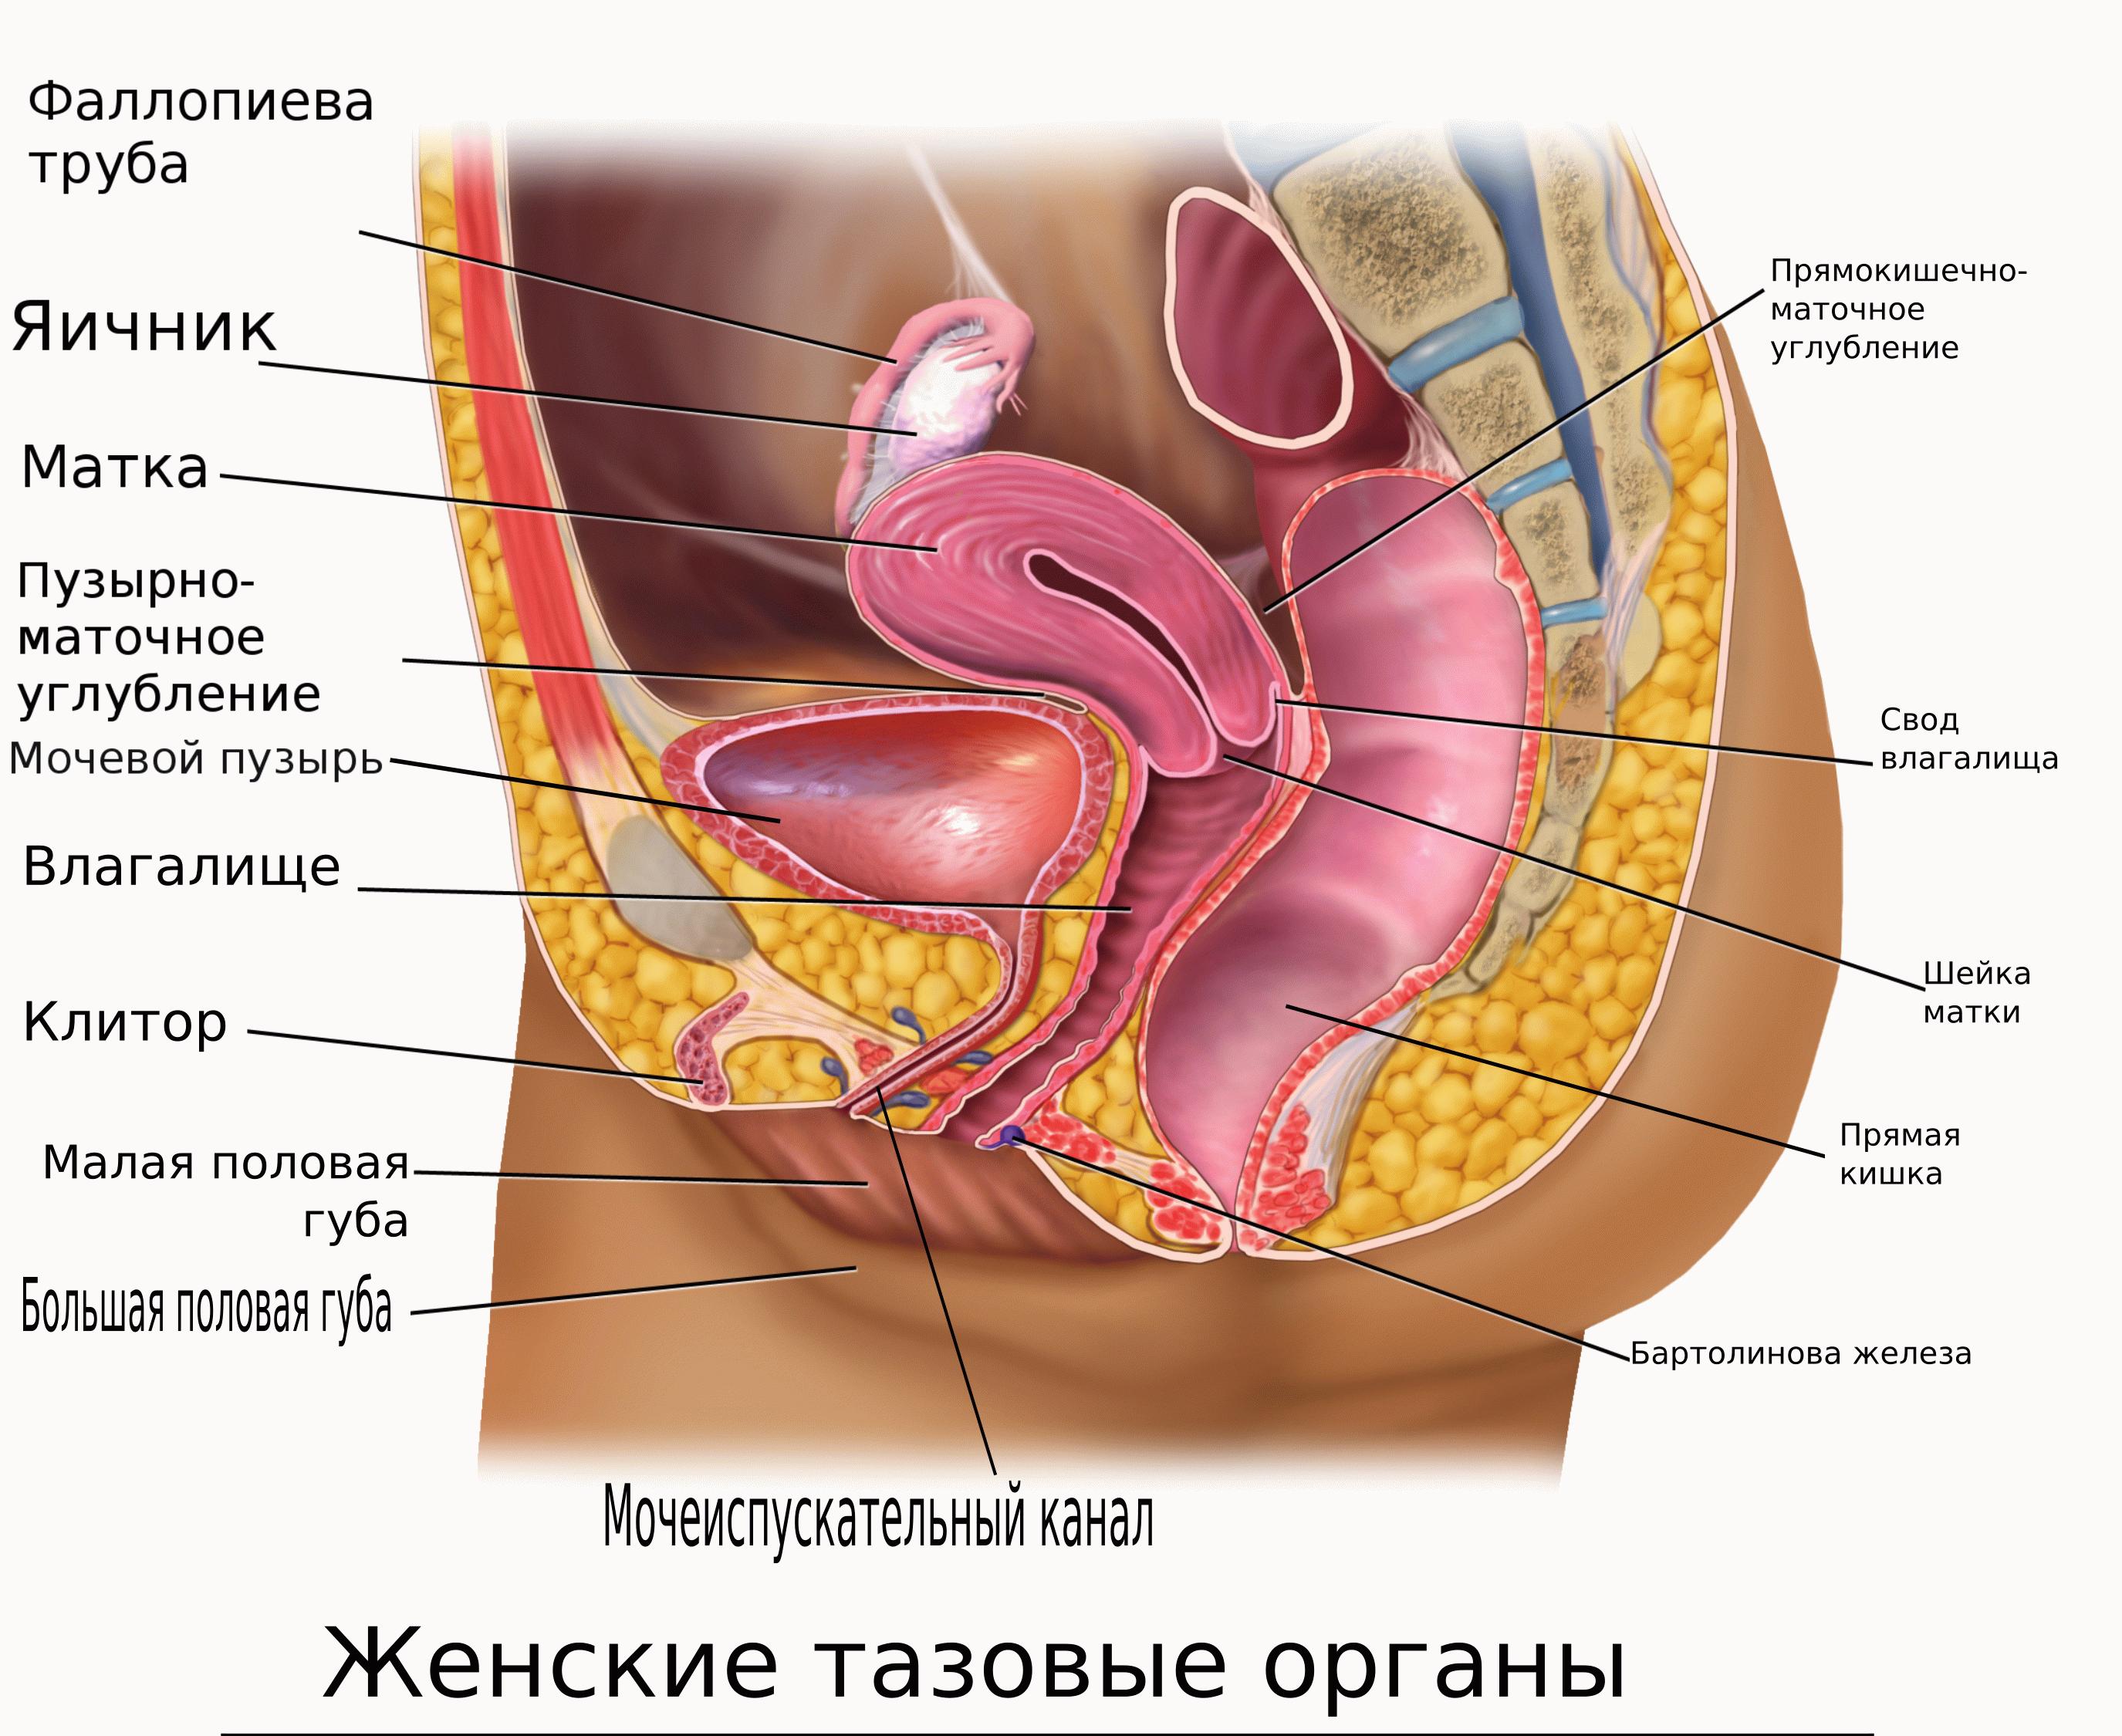 Органы таза